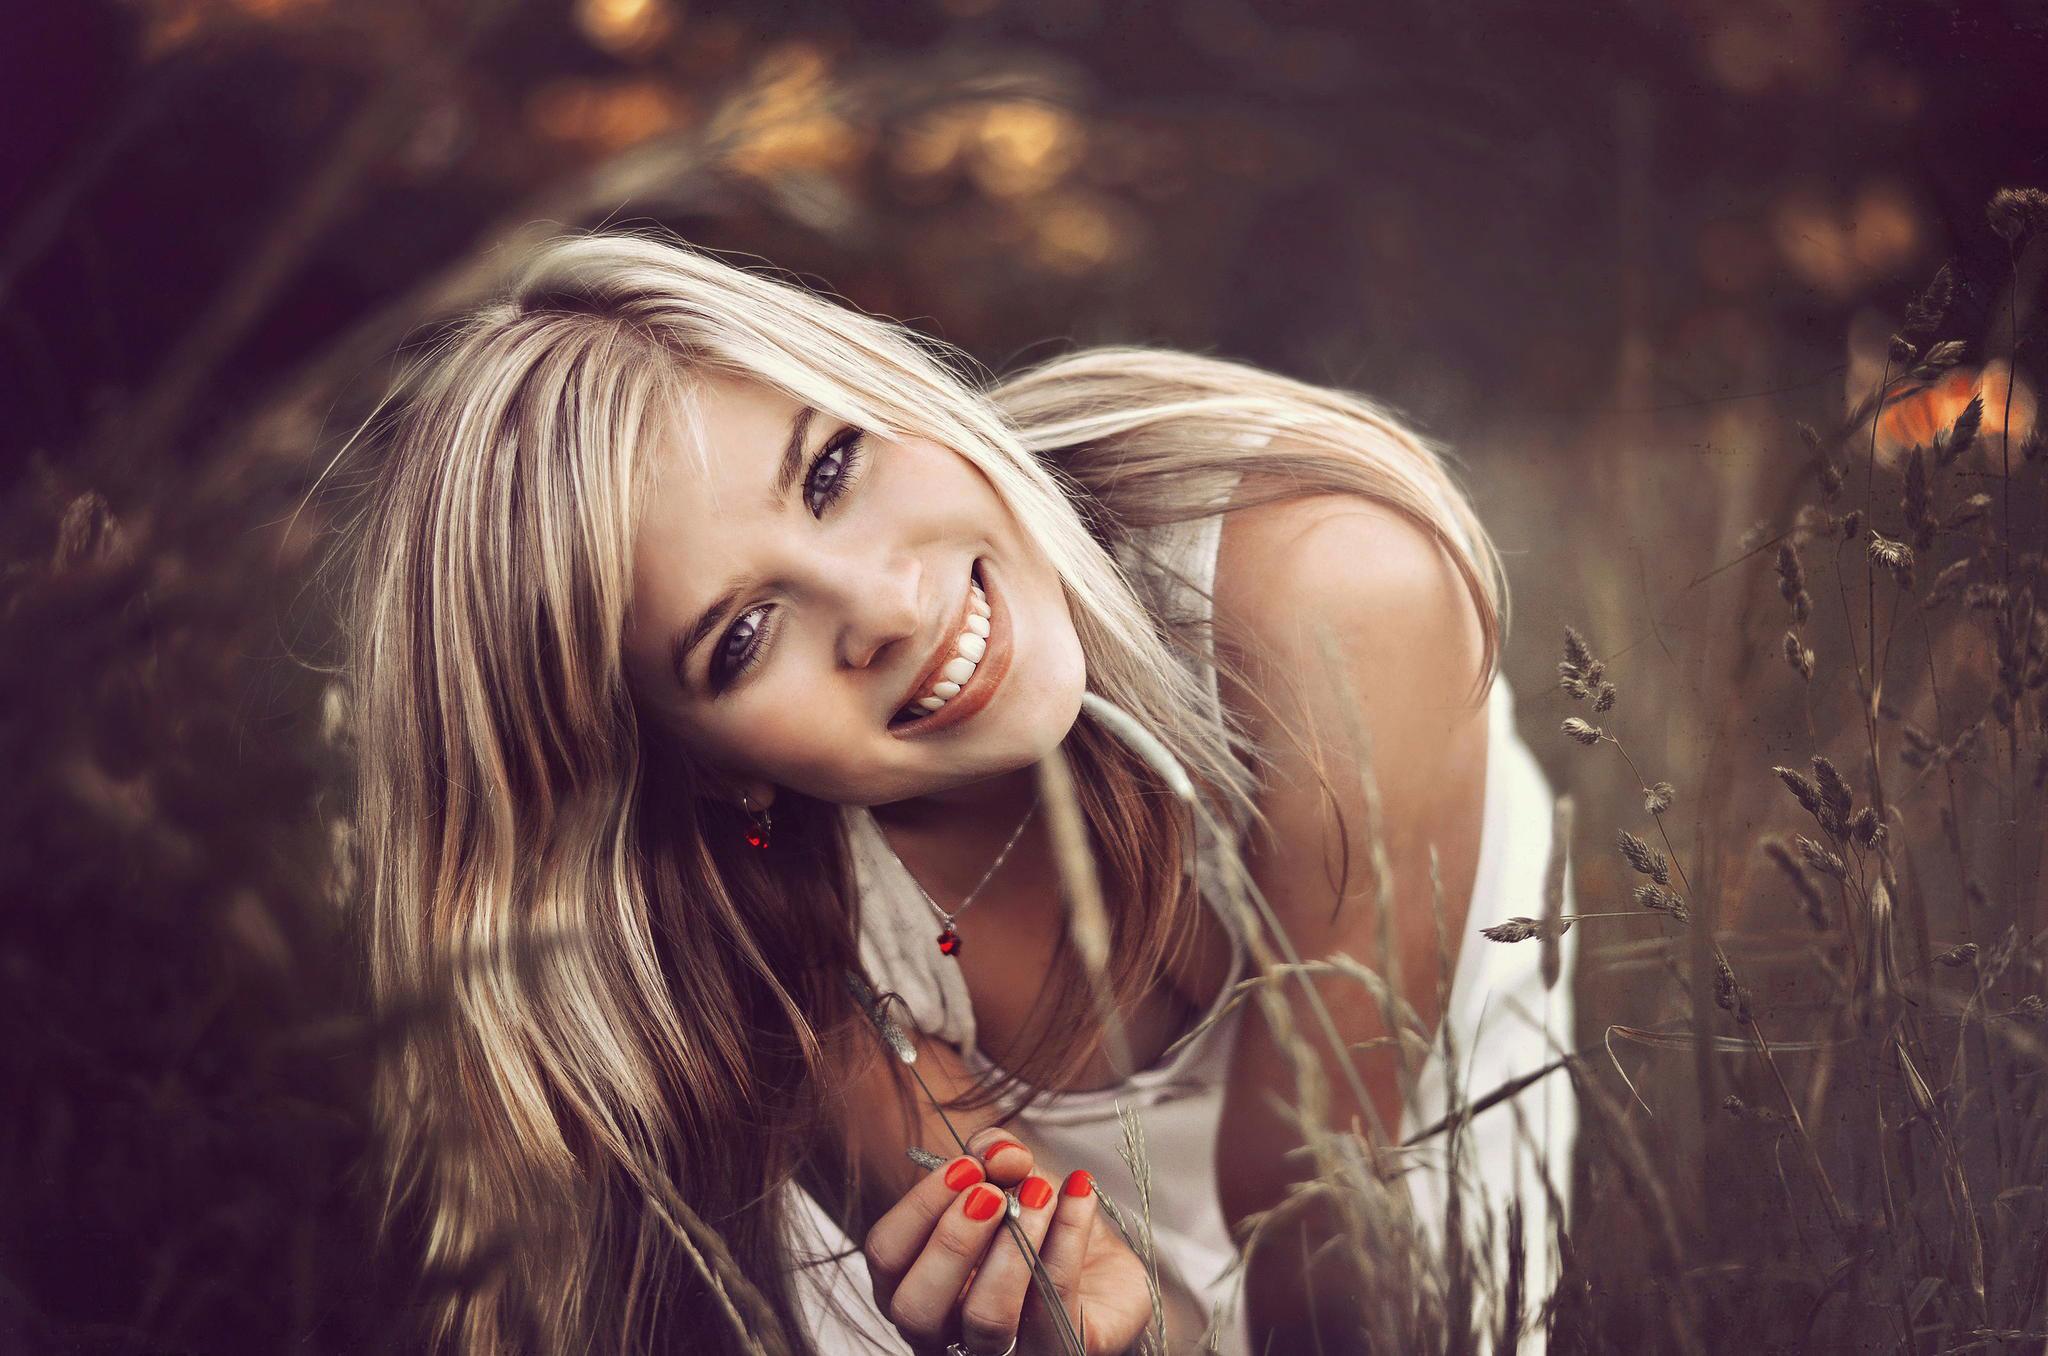 нежная искренняя улыбка  № 1853374 без смс